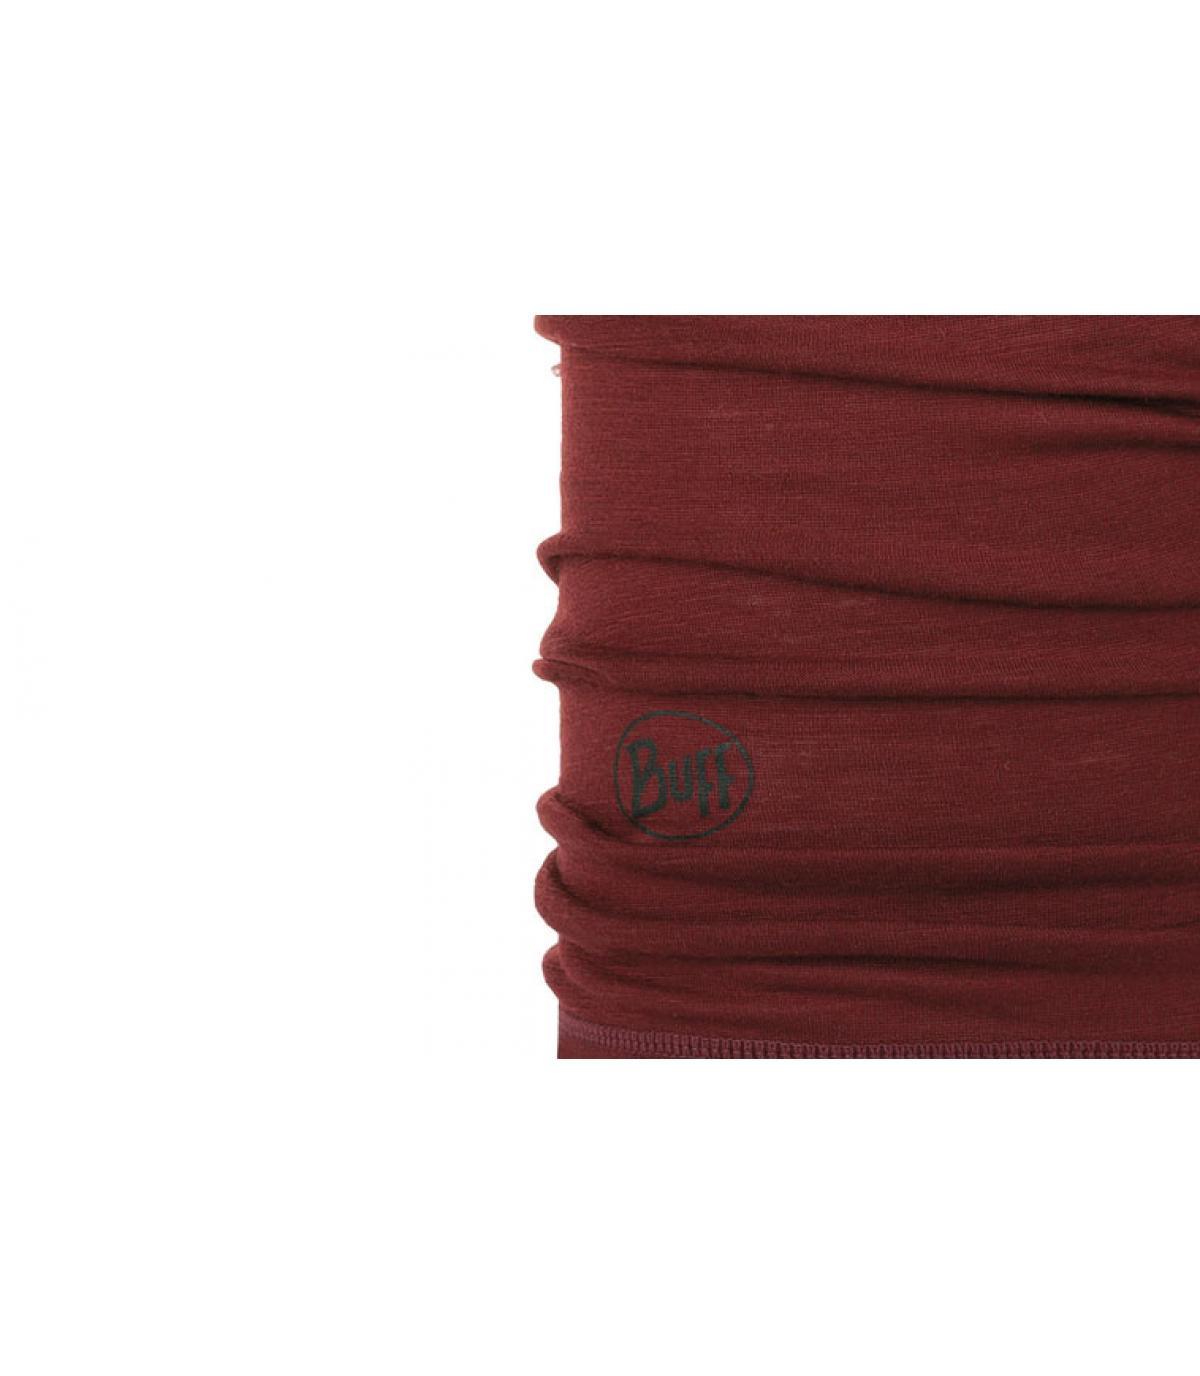 Détails Lightweight Merino Wool solid wine - image 2